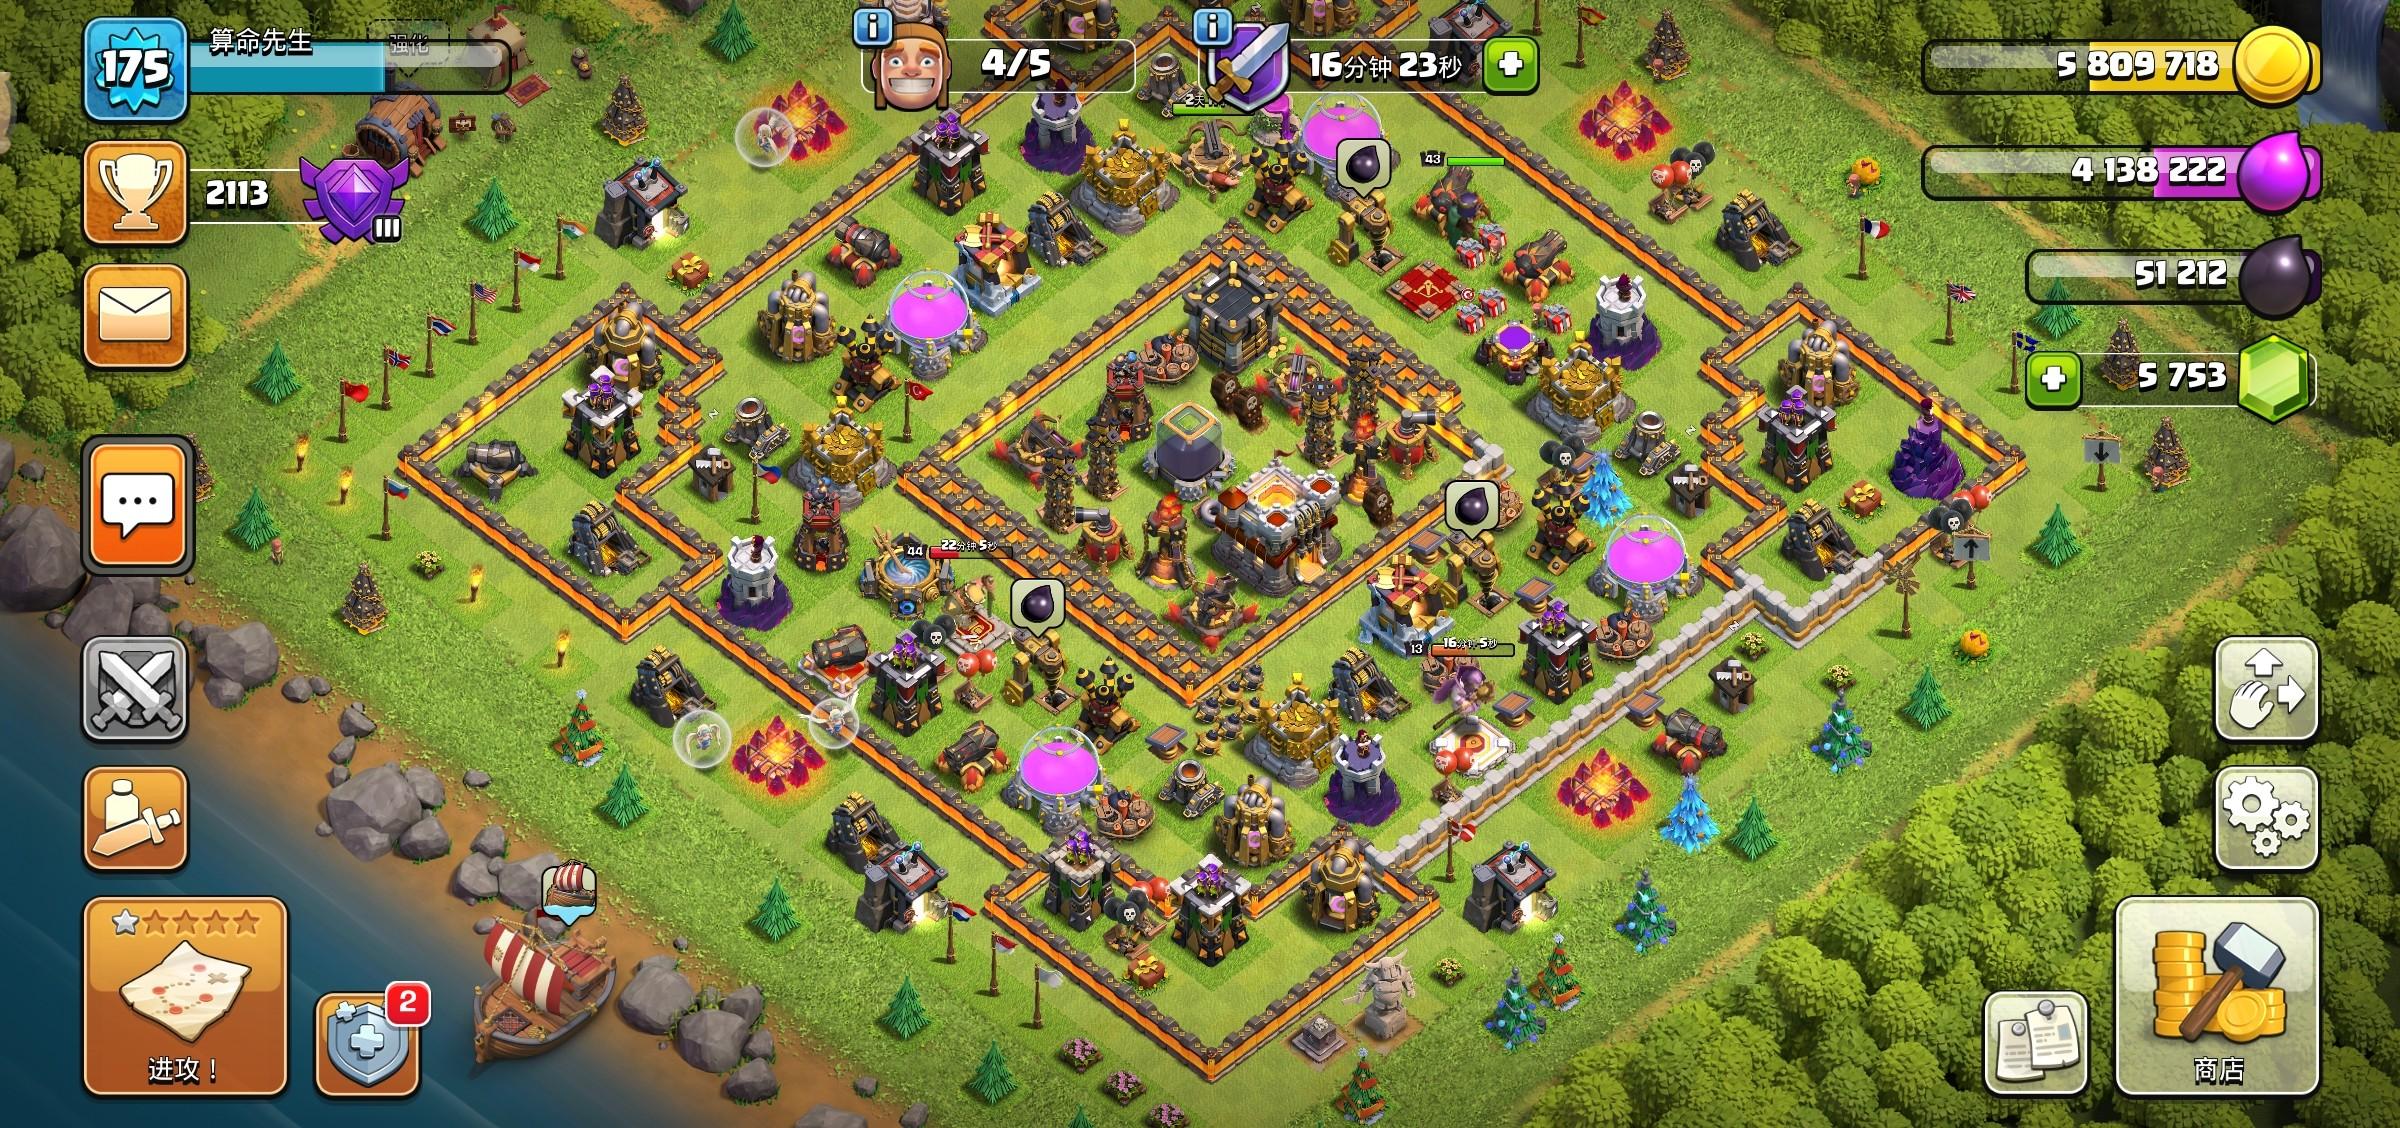 Screenshot_20200519_174854_com.supercell.clashofclans.baidu.jpg